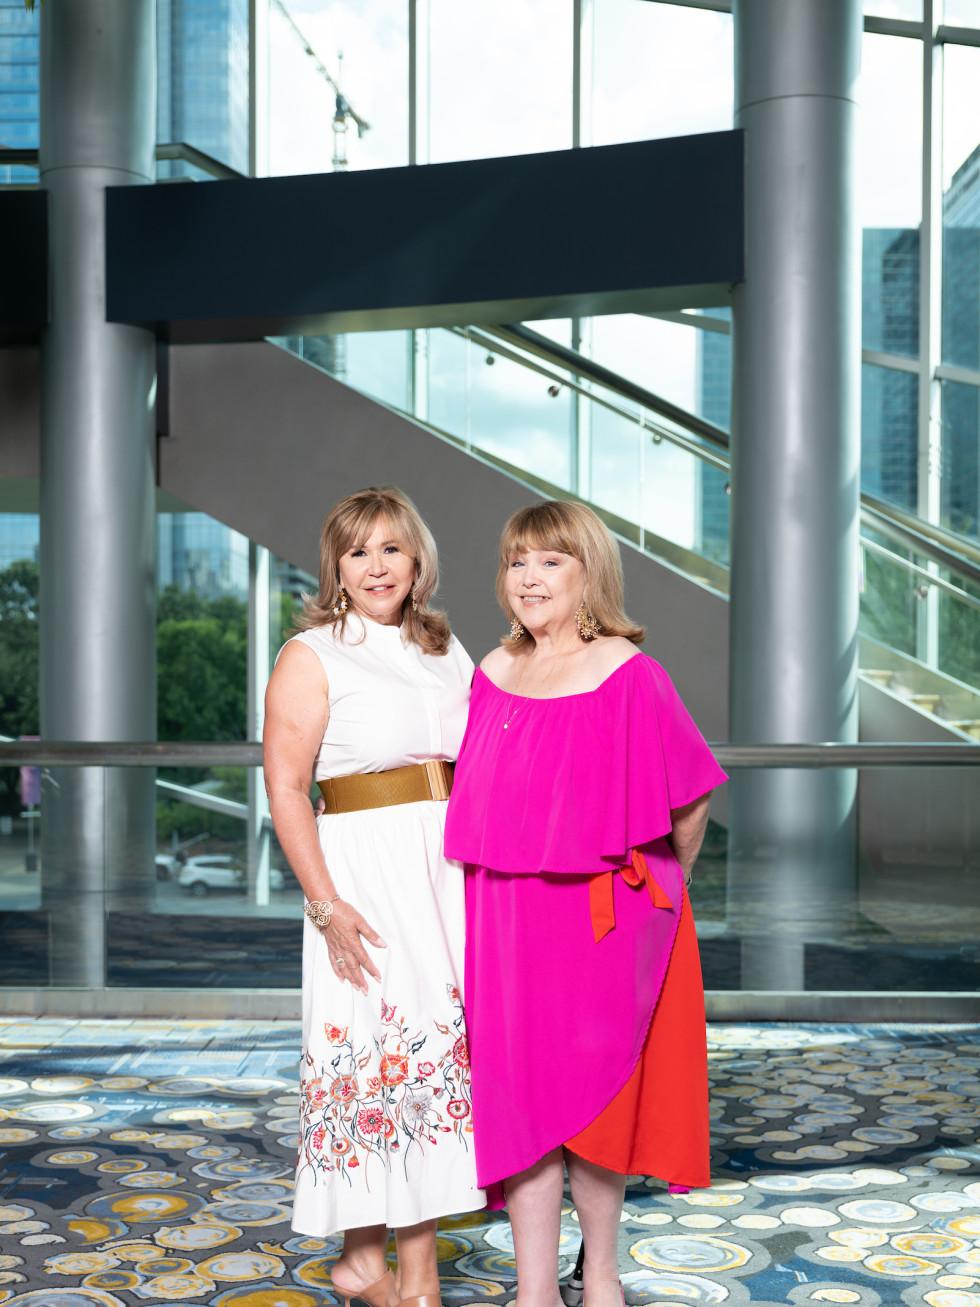 LWI Houston 2021 fashion show luncheon Cyndy Garza Roberts and Marilu Garza